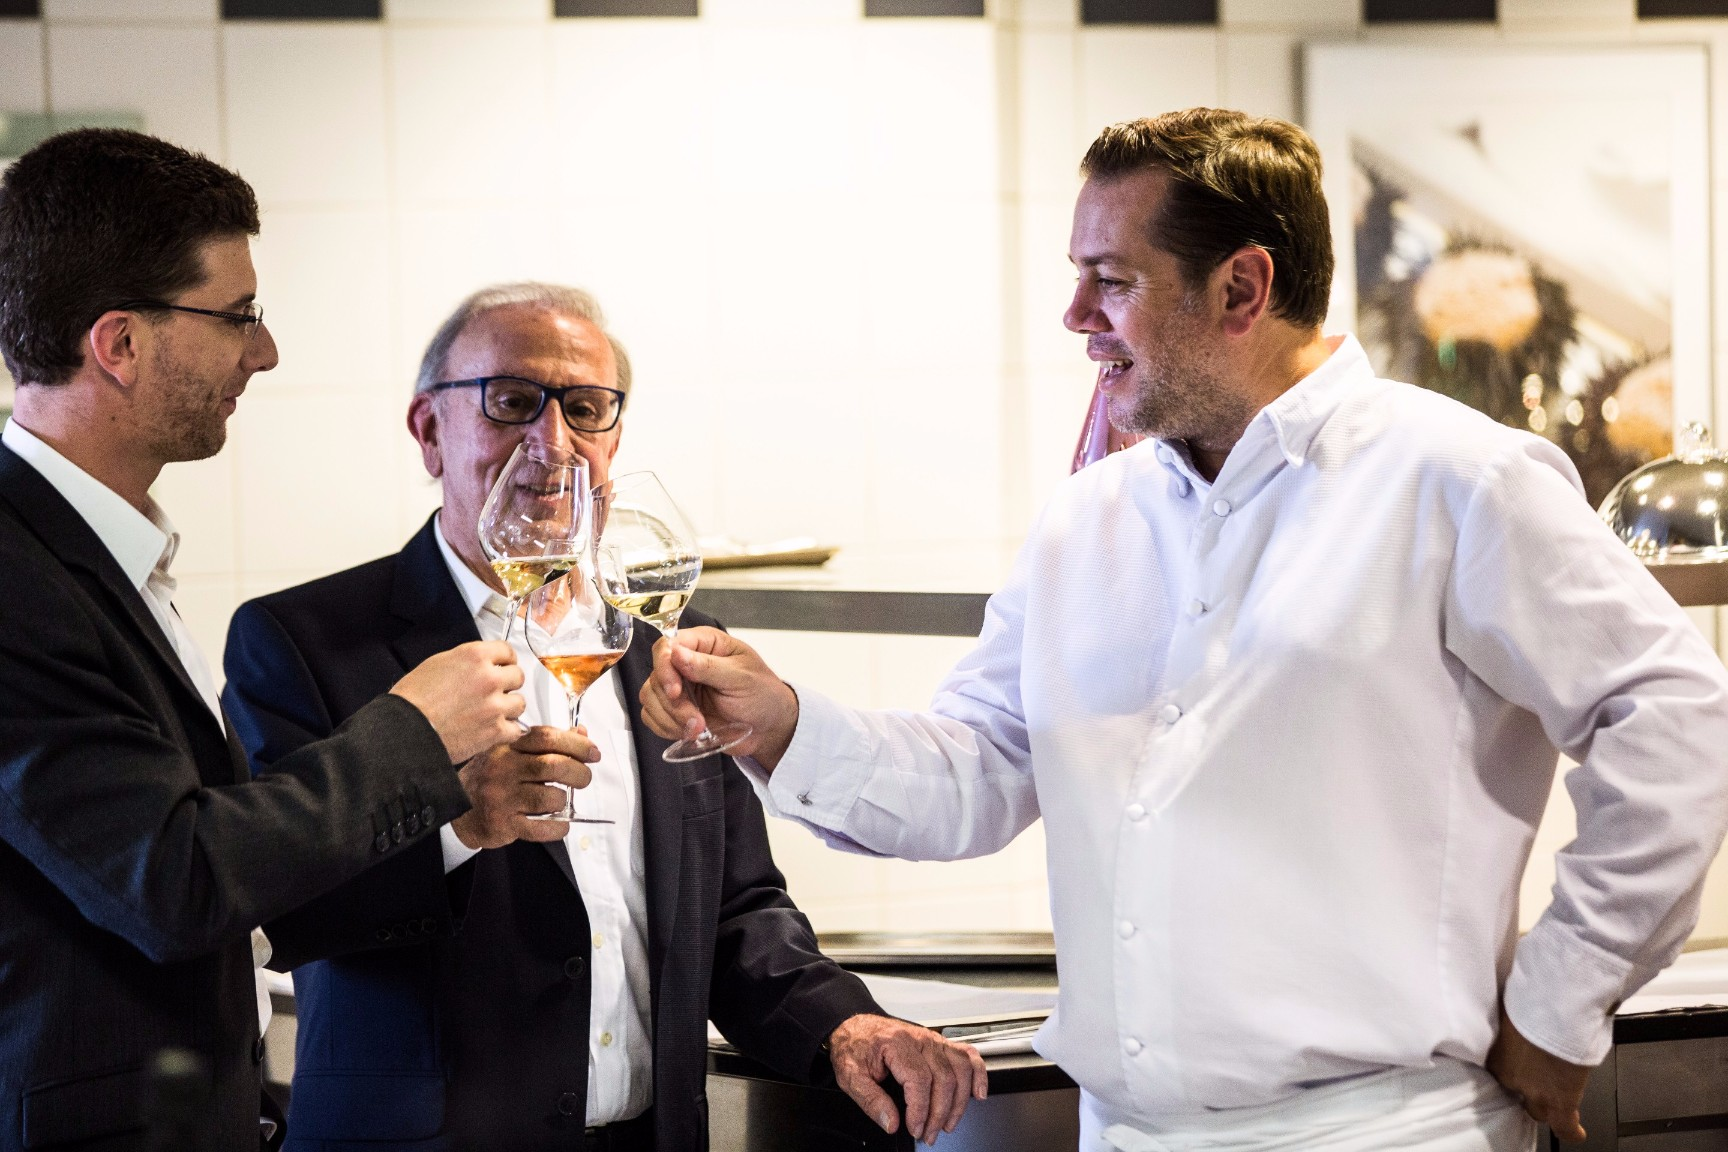 Armand de Brignac and L'Assiette Champenoise Unite